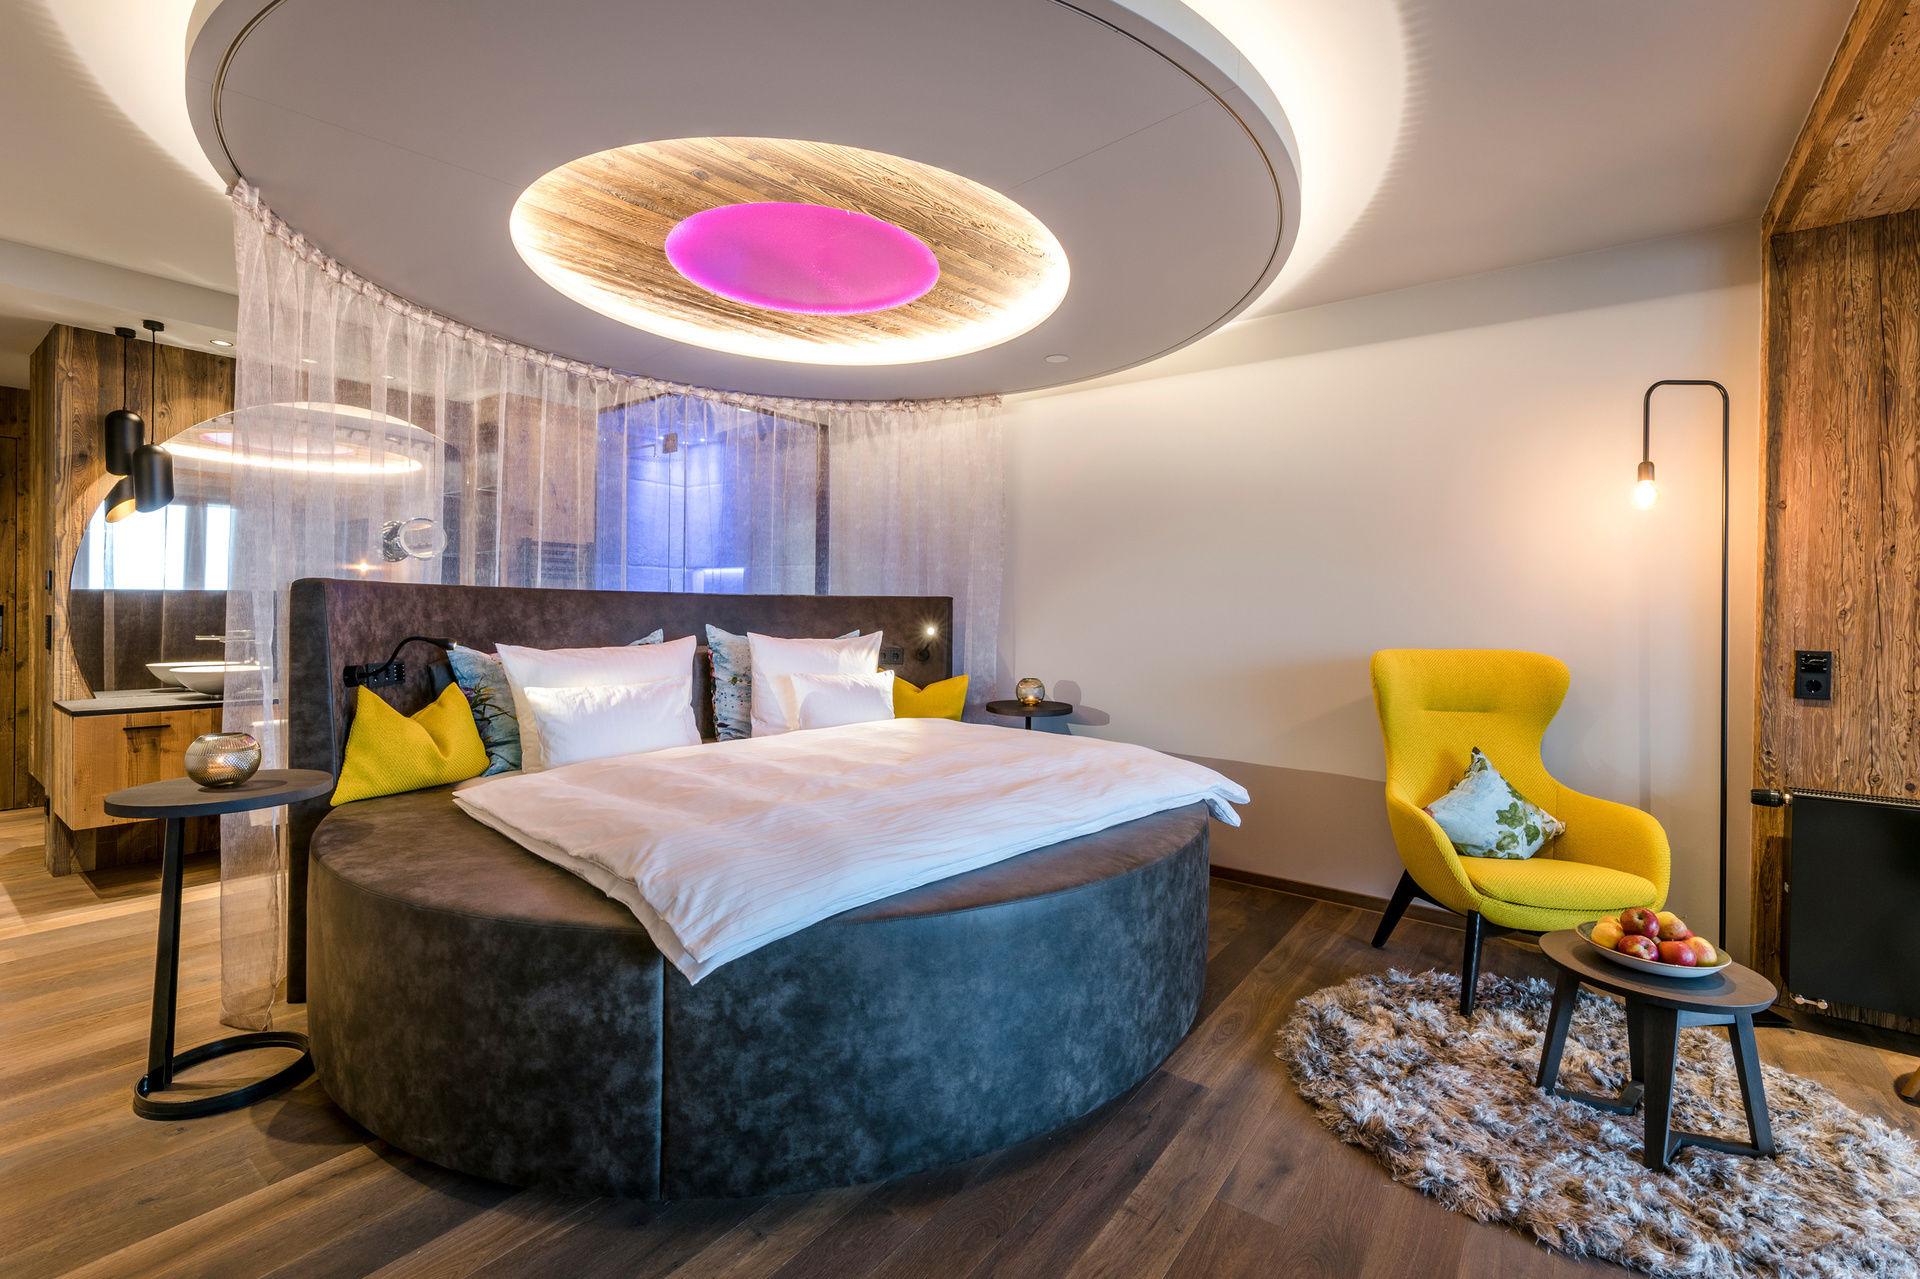 fr hbucher fr hbucherrabett angebote wellnesshotel h ttenhof 4 sterne. Black Bedroom Furniture Sets. Home Design Ideas